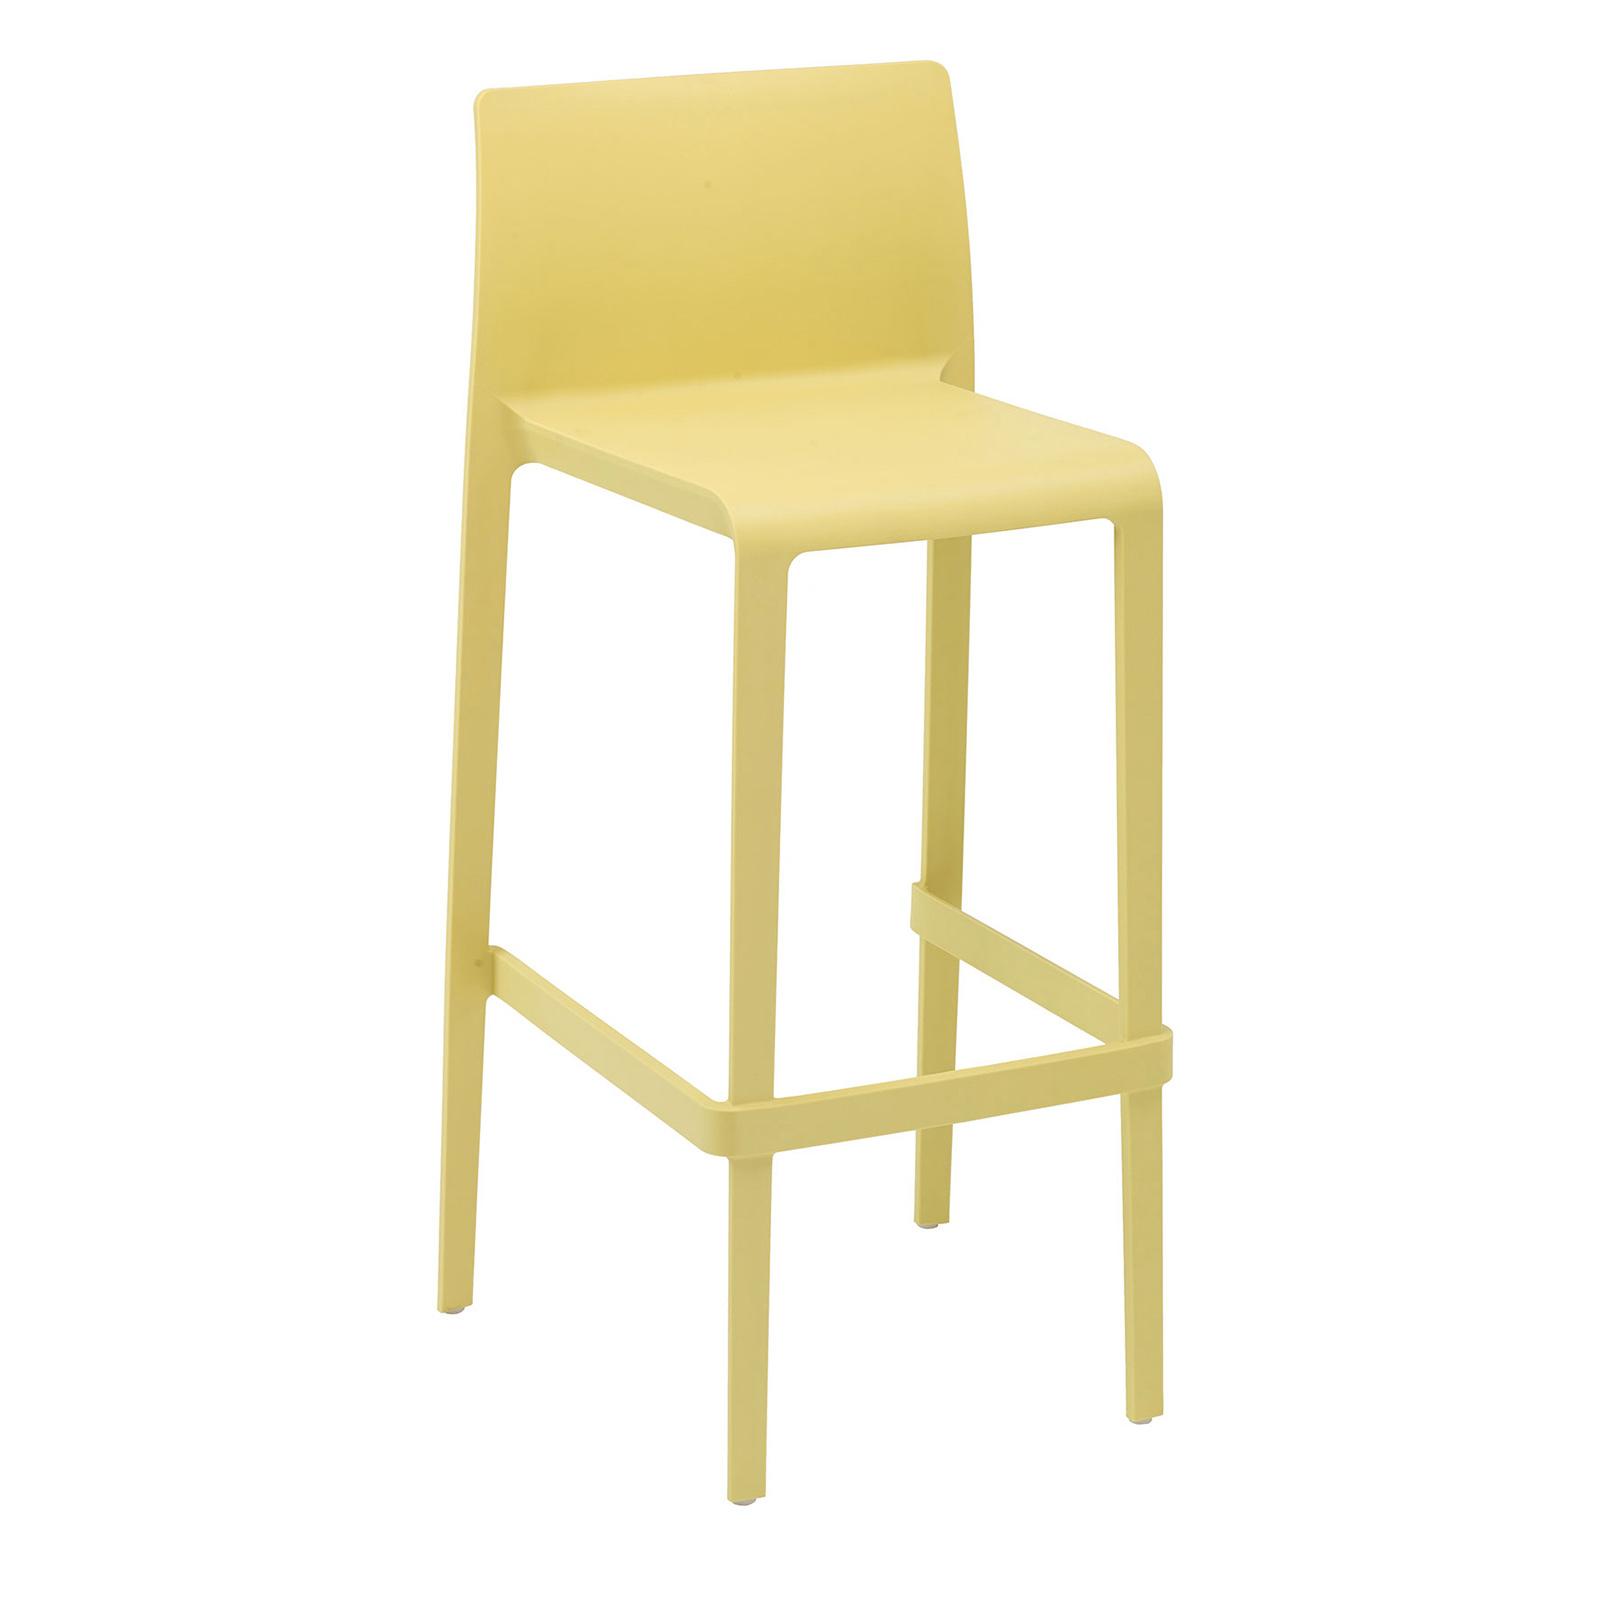 Florida Seating VOLT-B / YELLOW bar stool, stacking, outdoor